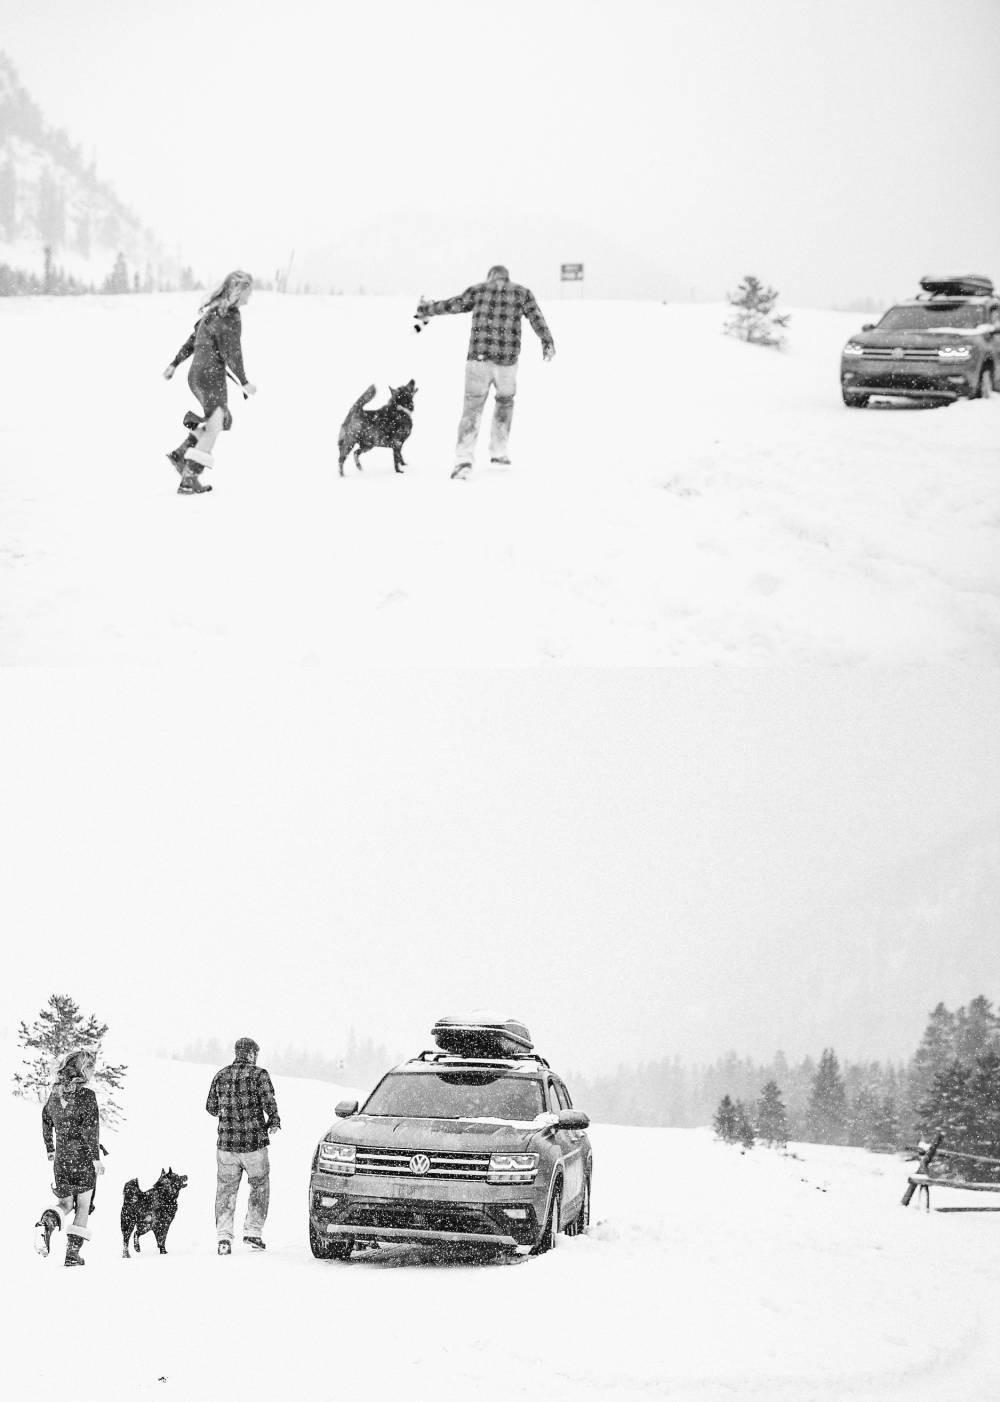 colorado winter engagement photos with a dog